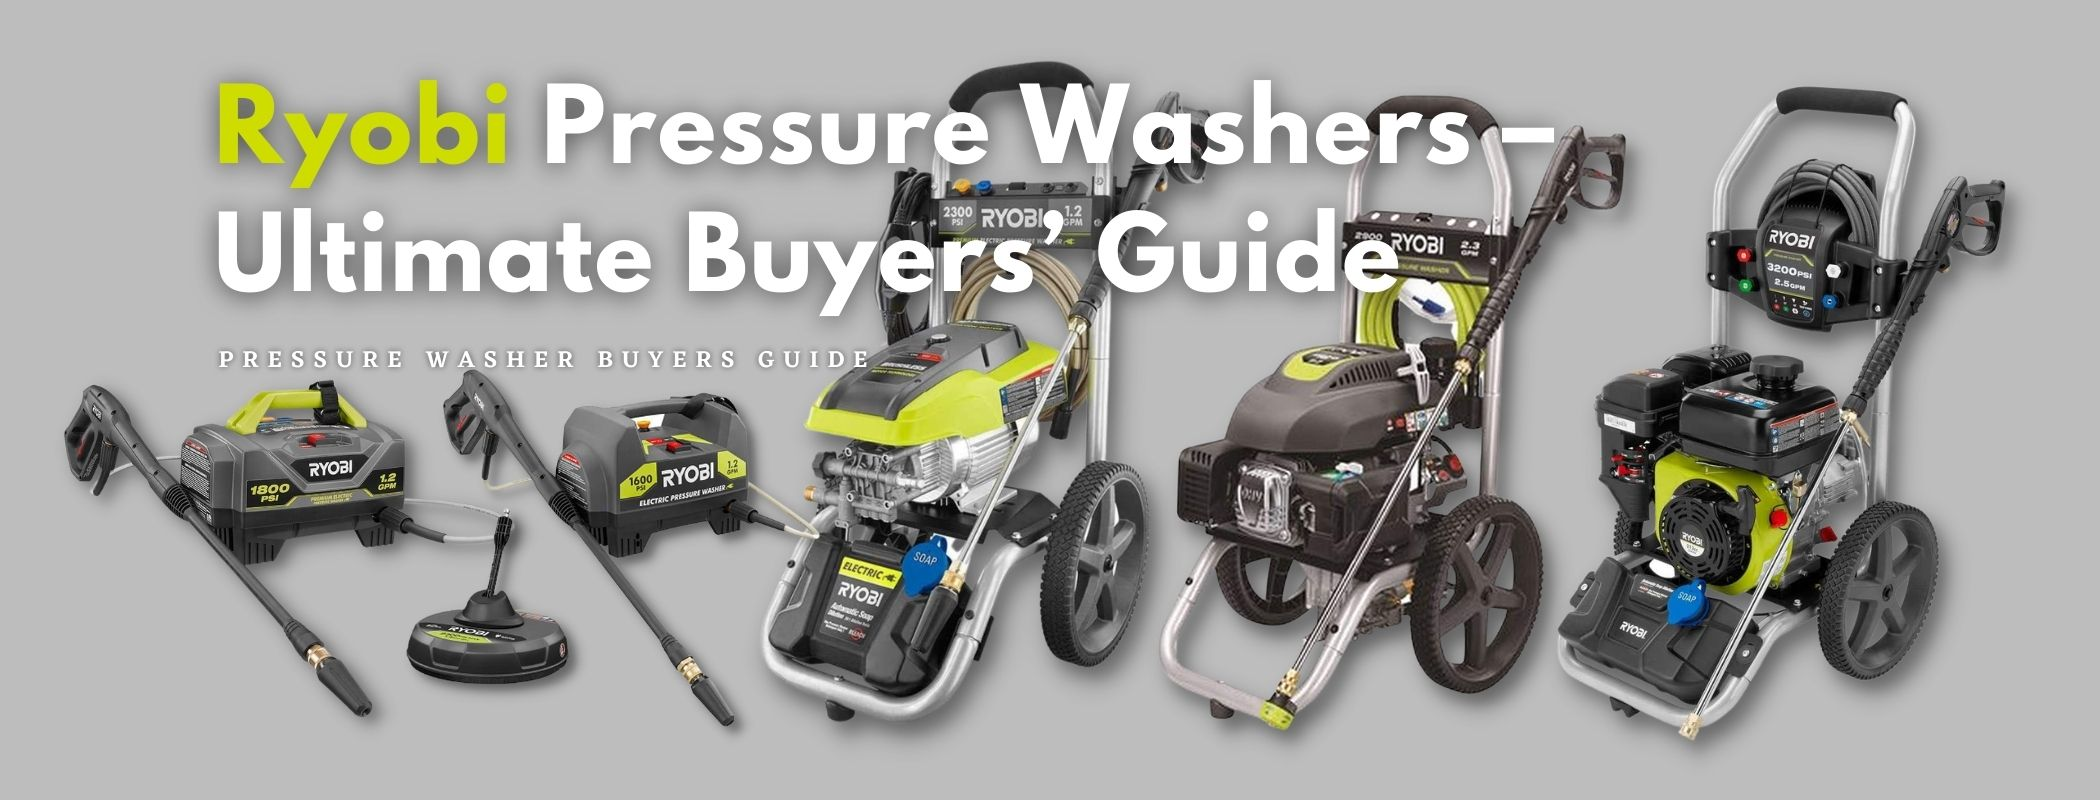 Ryobi Pressure Washers – Ultimate Buyers' Guide